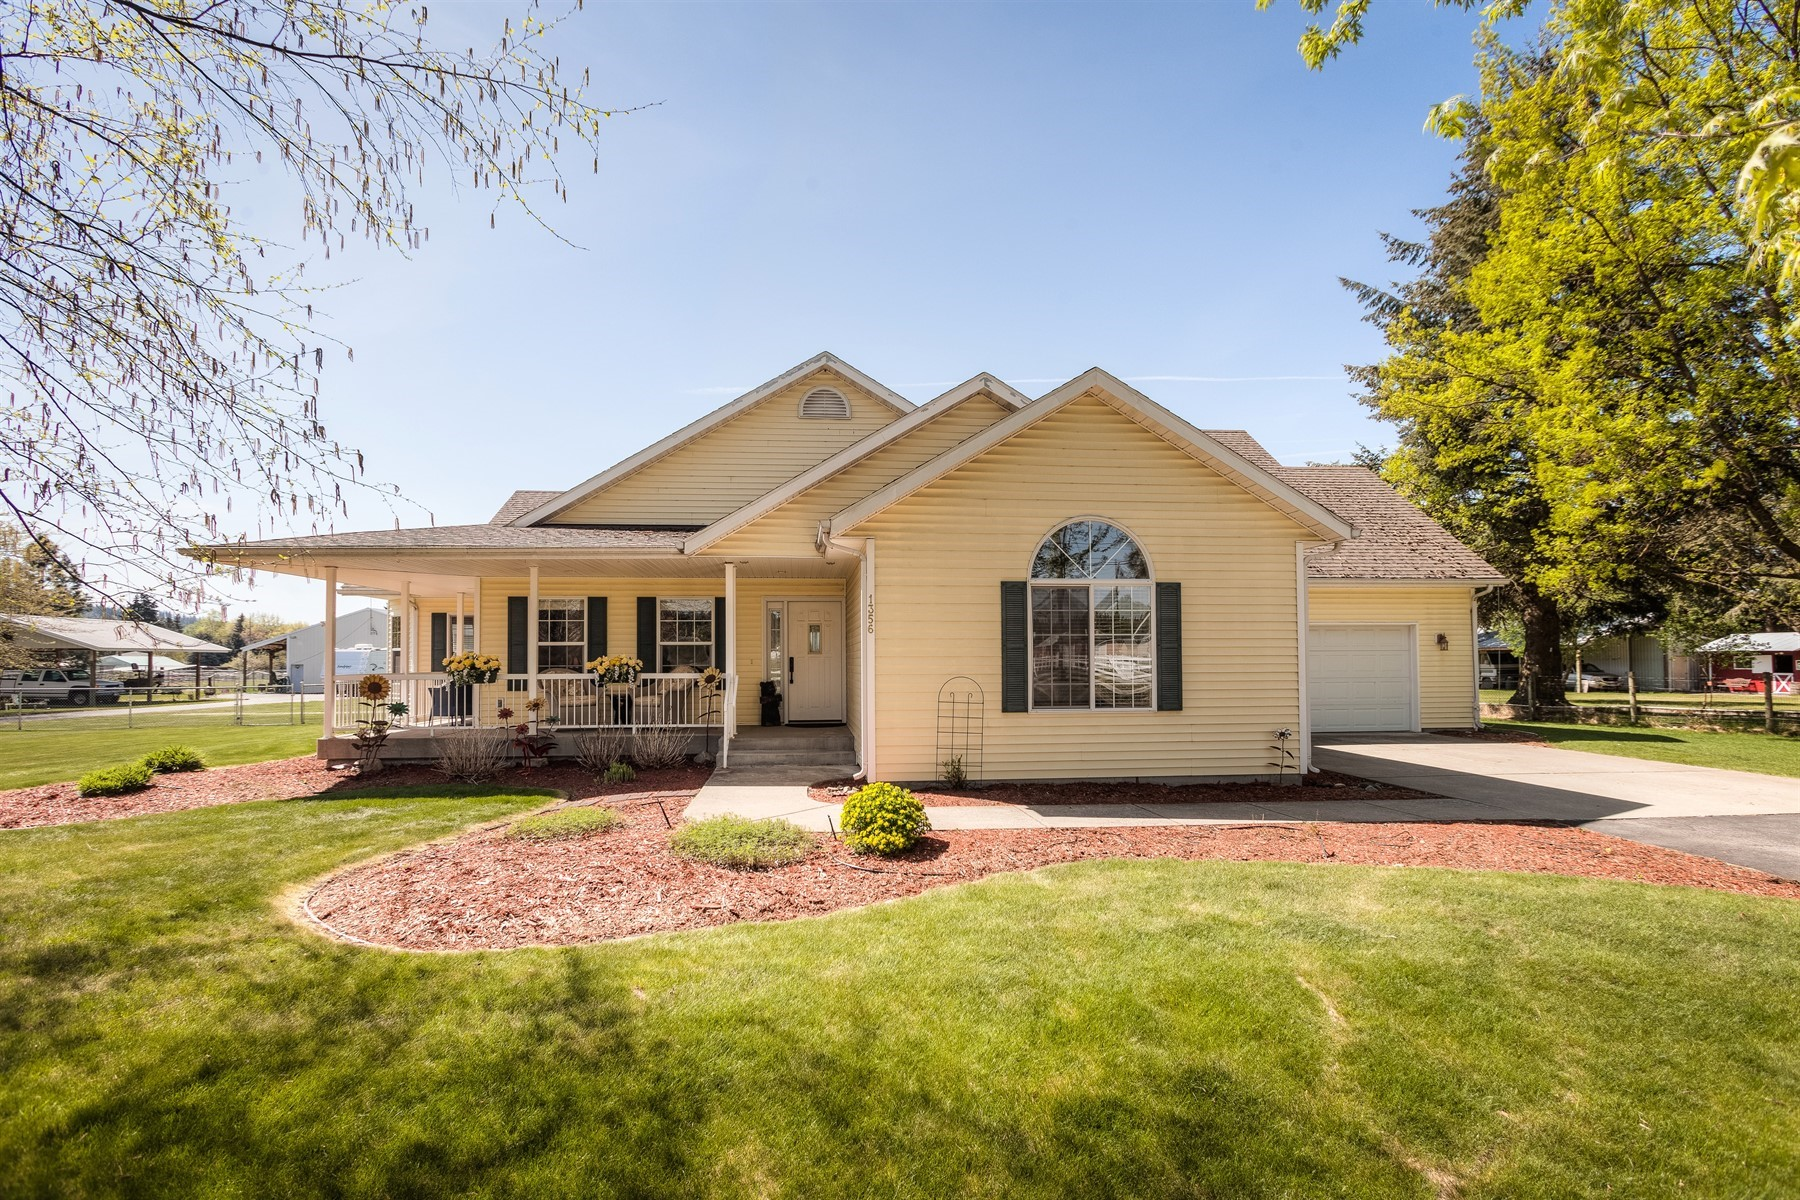 Single Family Home for Active at Rare Dalton Gardens custom-built home 1356 E Wilbur Ave Dalton Gardens, Idaho 83815 United States